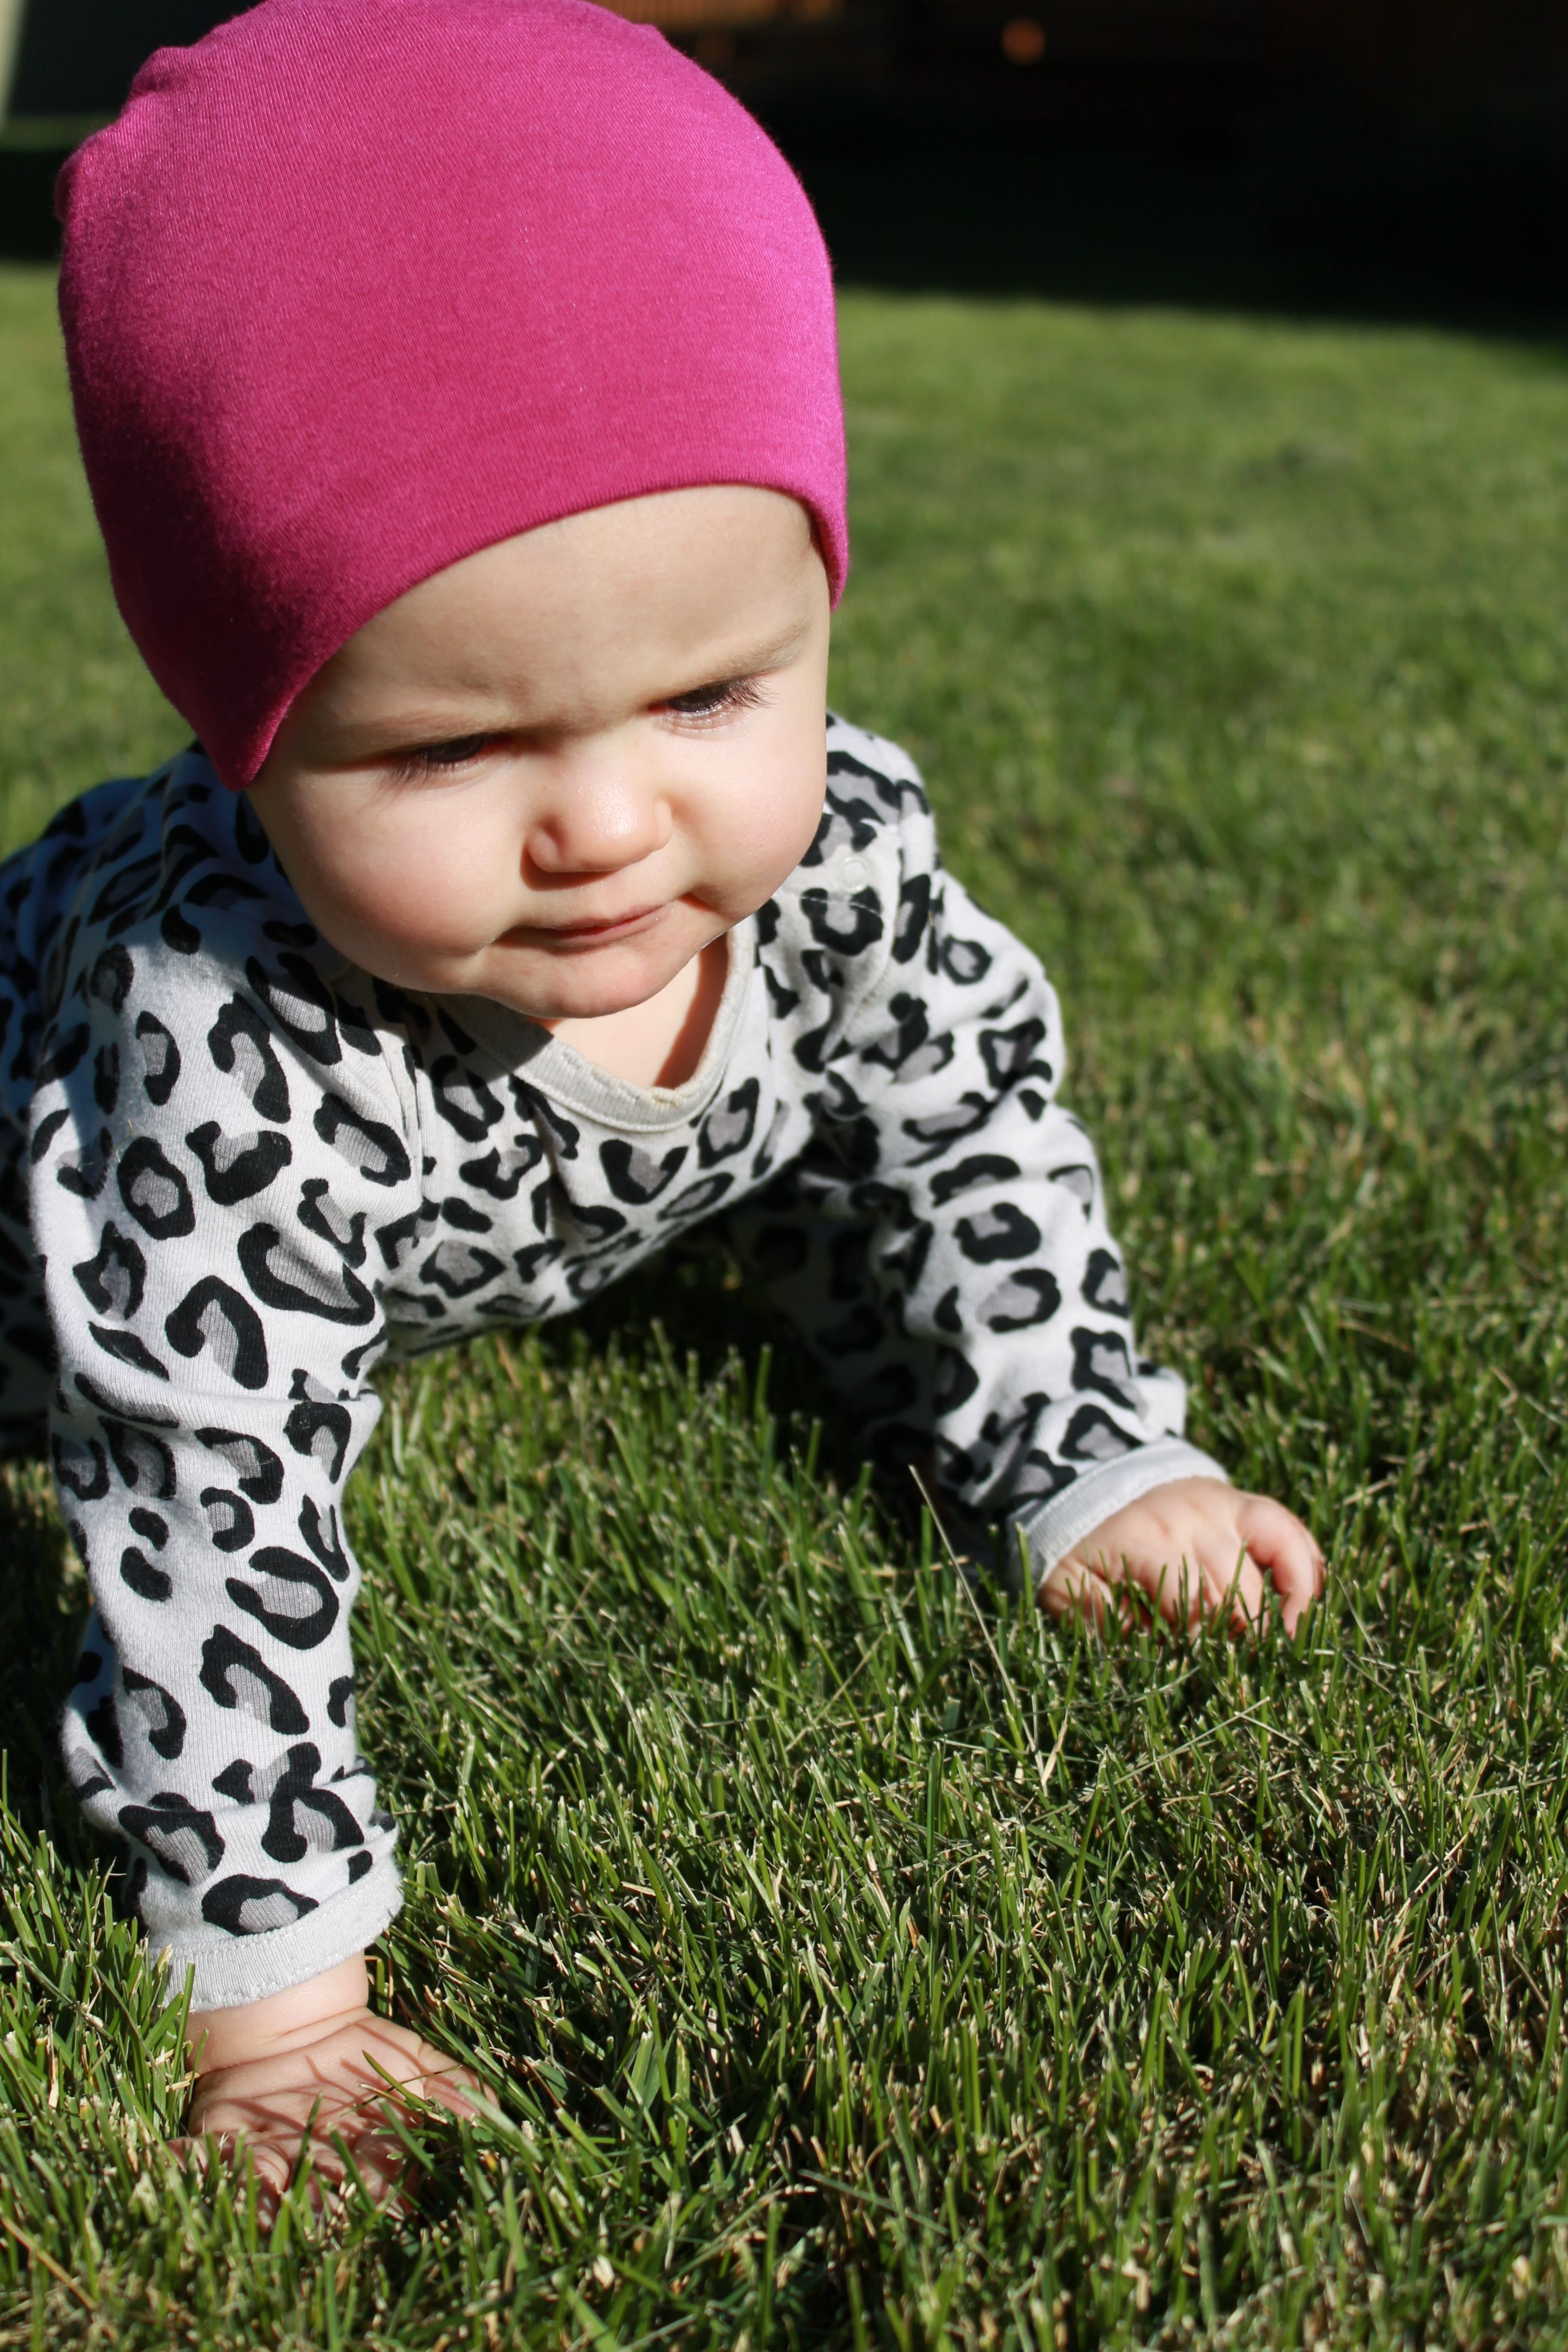 Freyja looking adorable in her Yala Baby Bamboo Dreams Beanie in Raspberry.